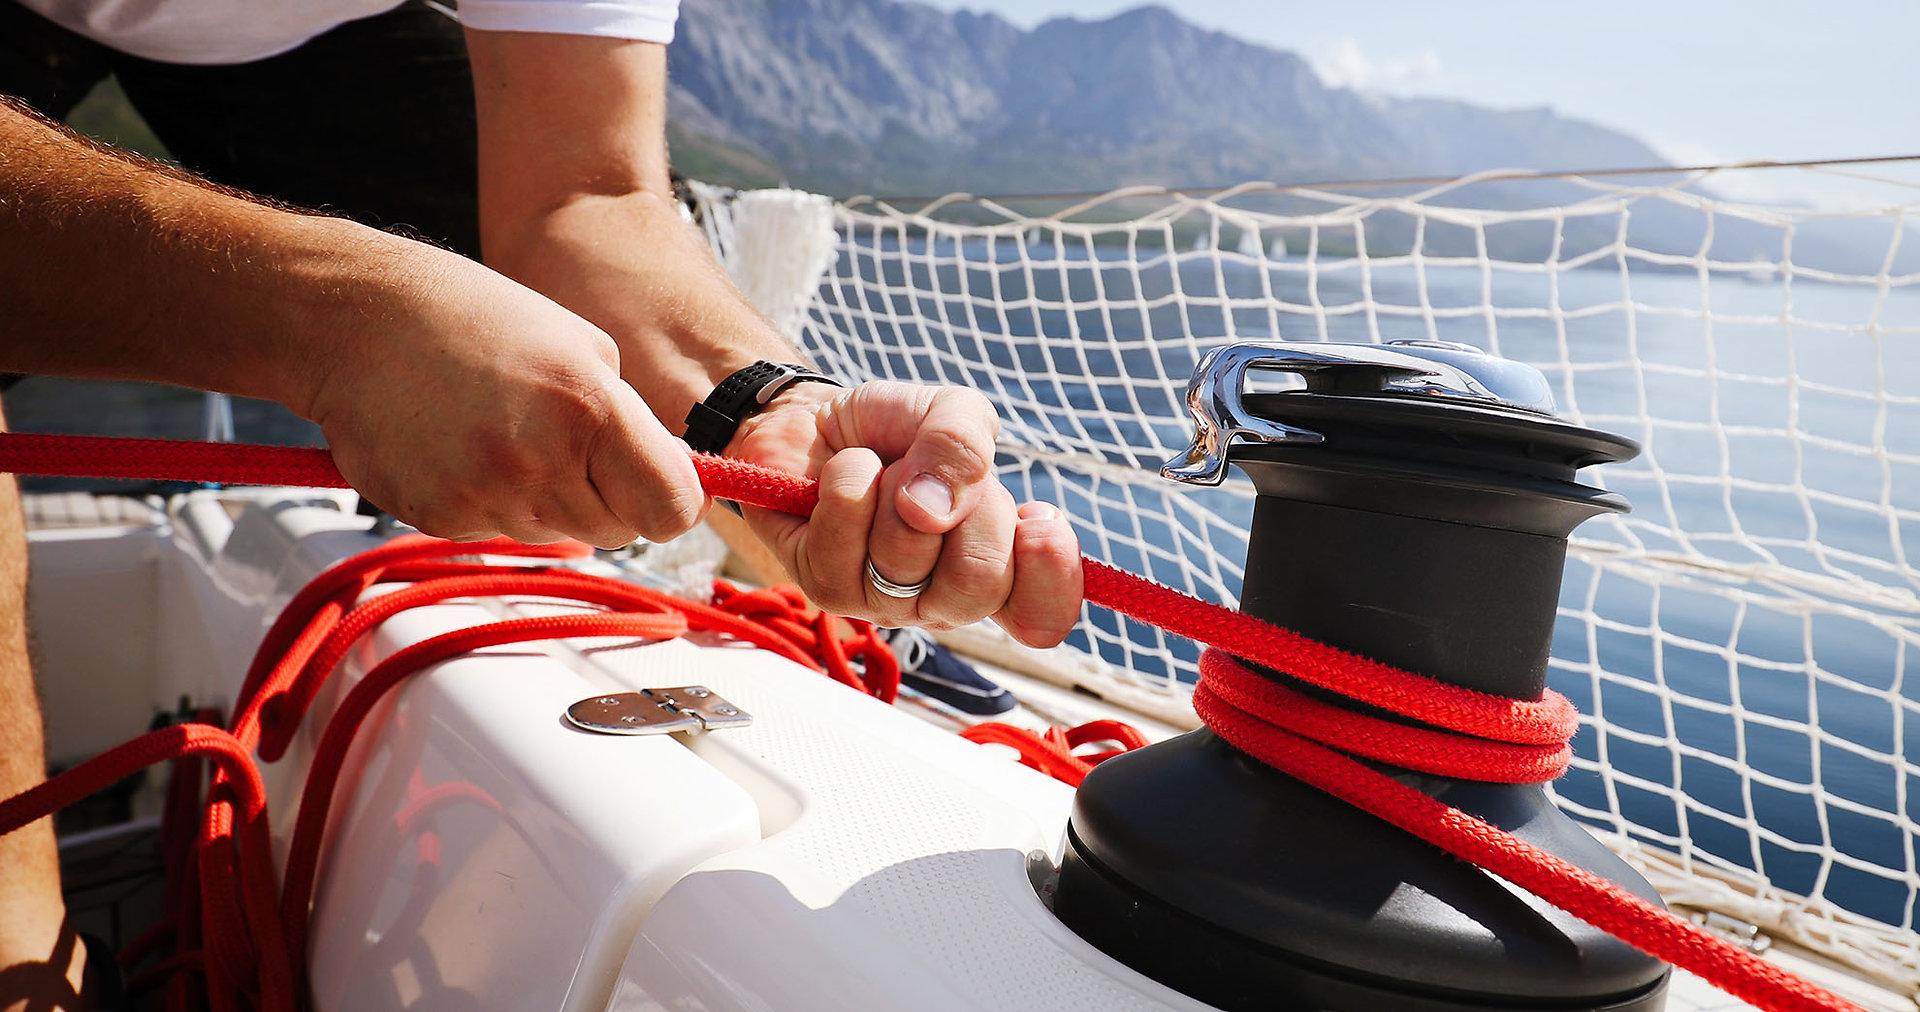 Scuola Vela Capri - Yacht Club Capri - 2